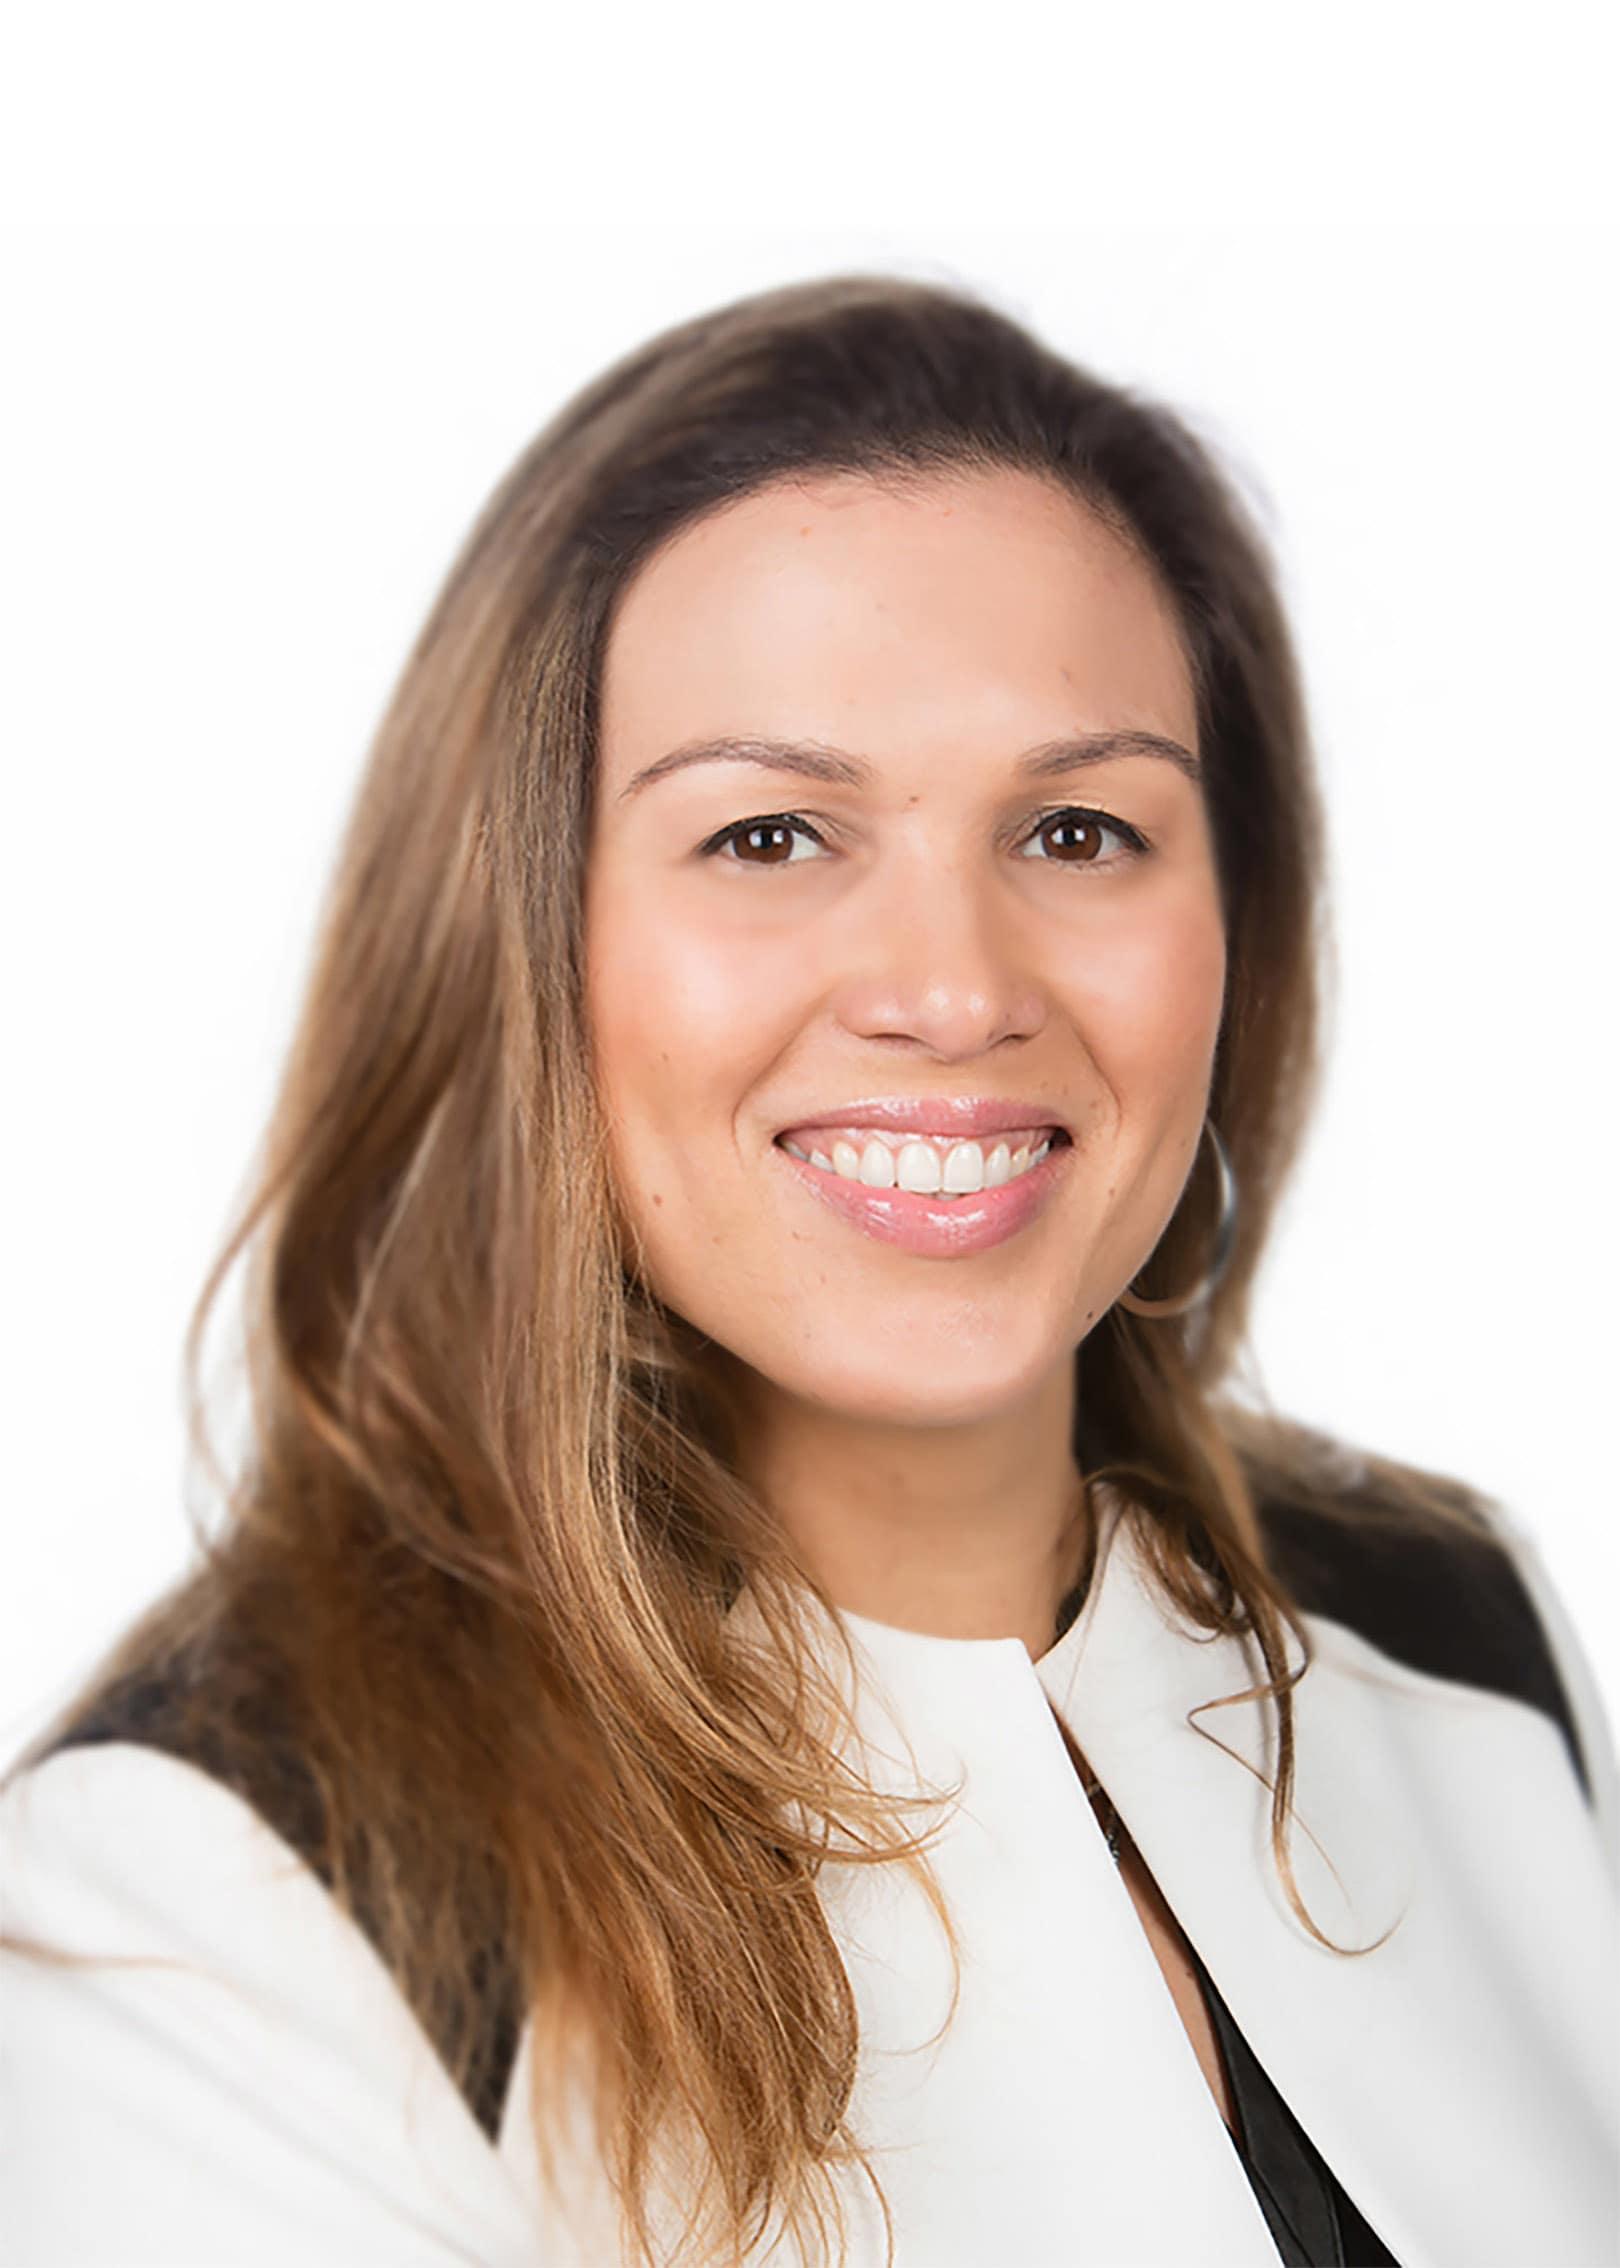 Yiselle Santos Rivera - main image